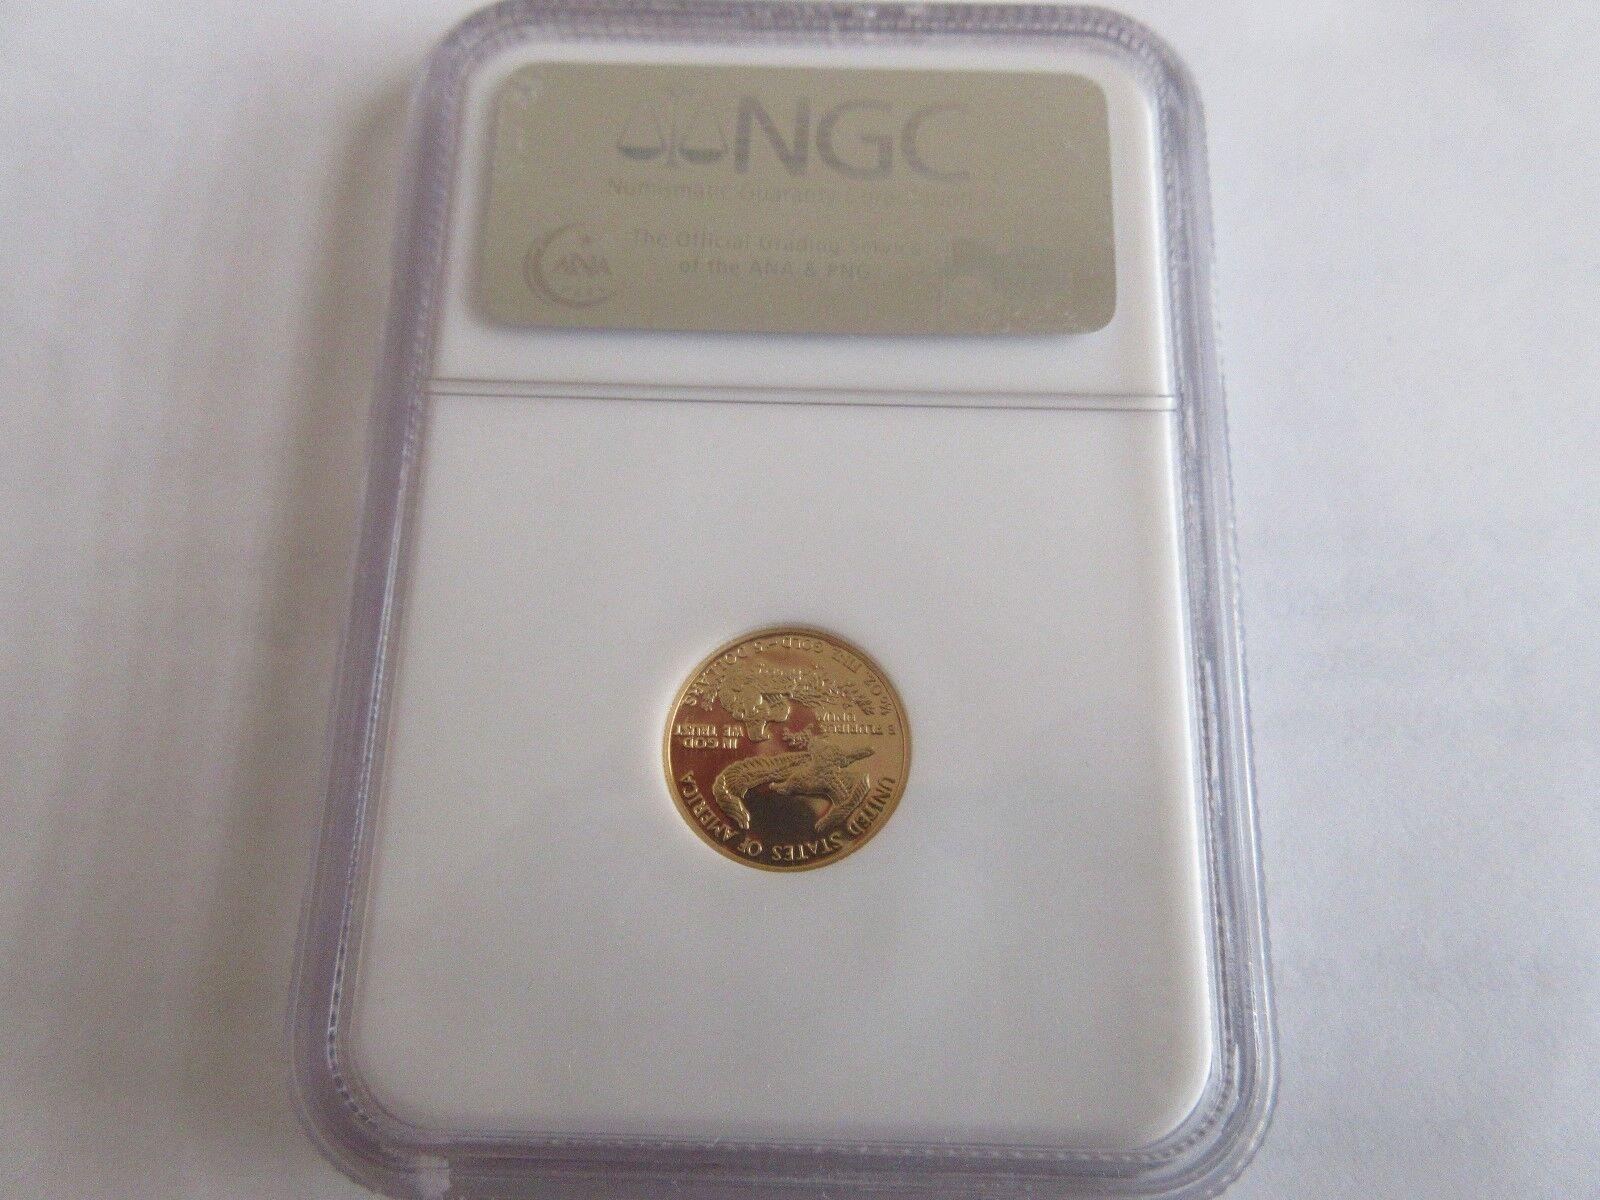 1989 P Gold Eagle G$5 NGC PF 70 Ultra Cameo